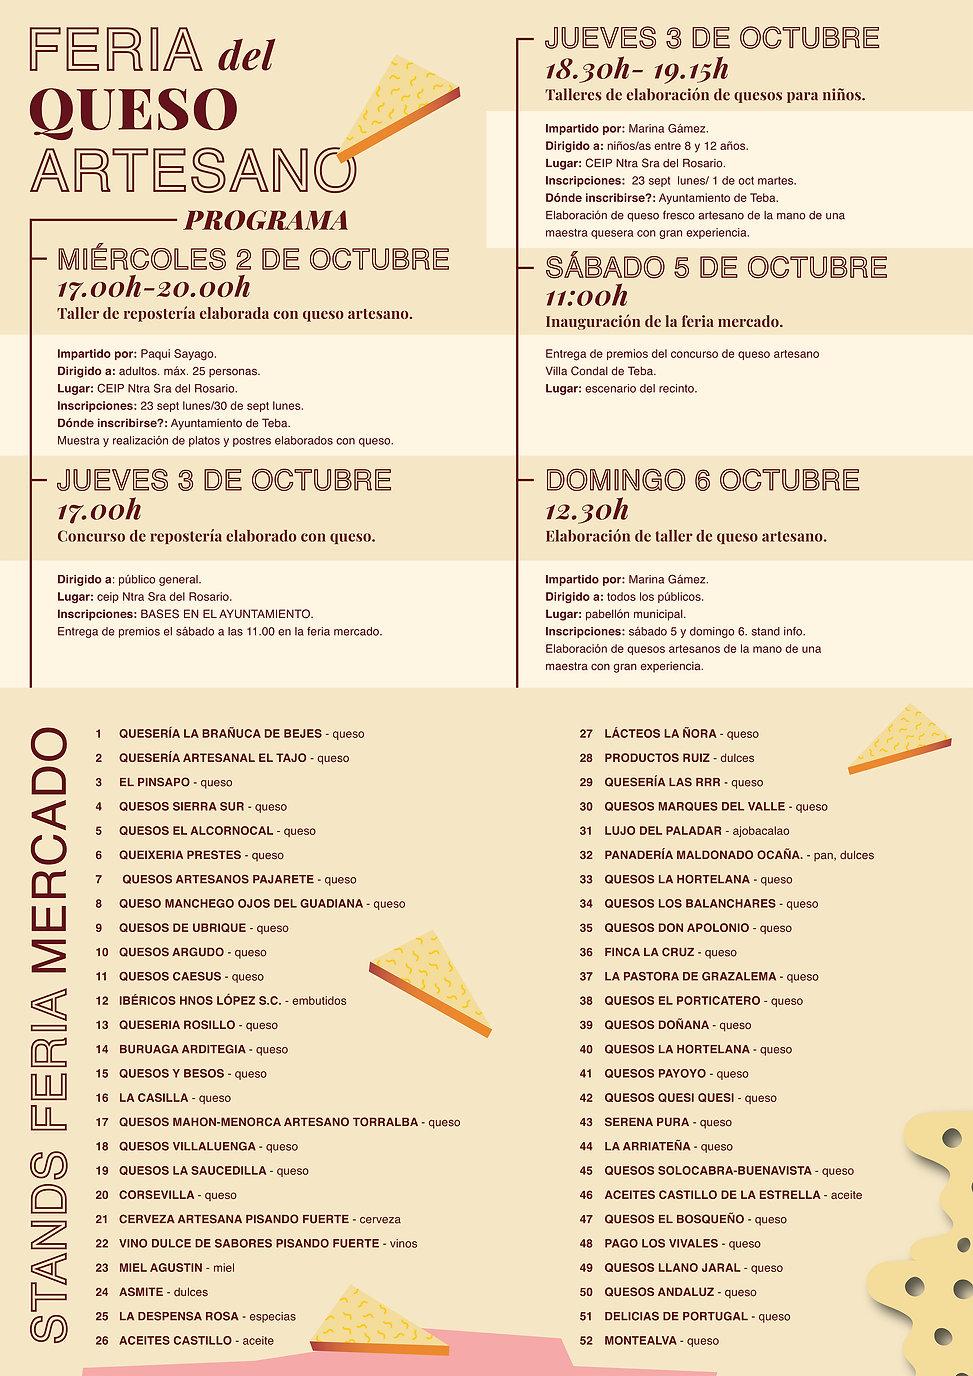 02_Programa 2019.jpg